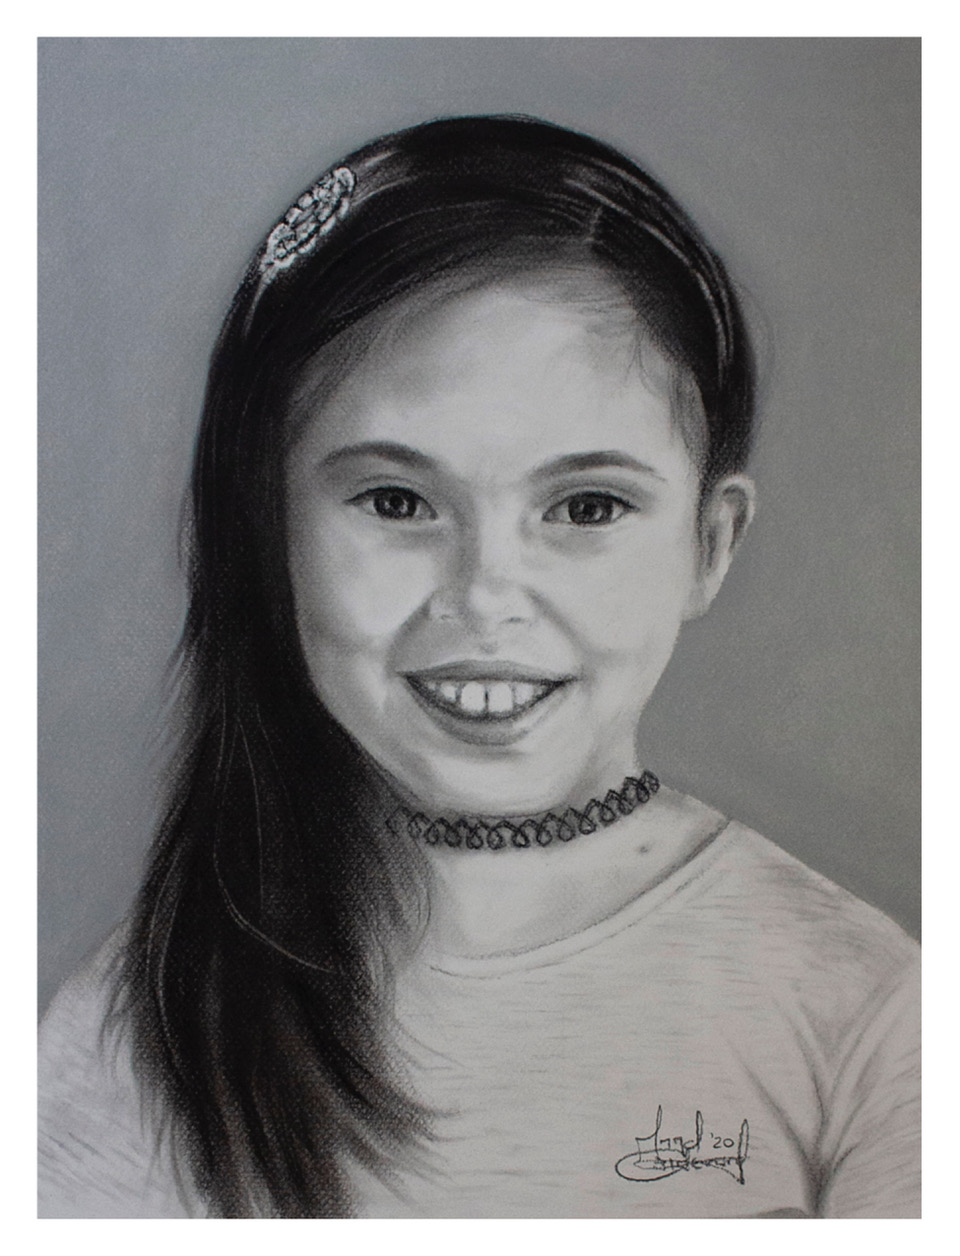 A. Calderone - Daughter